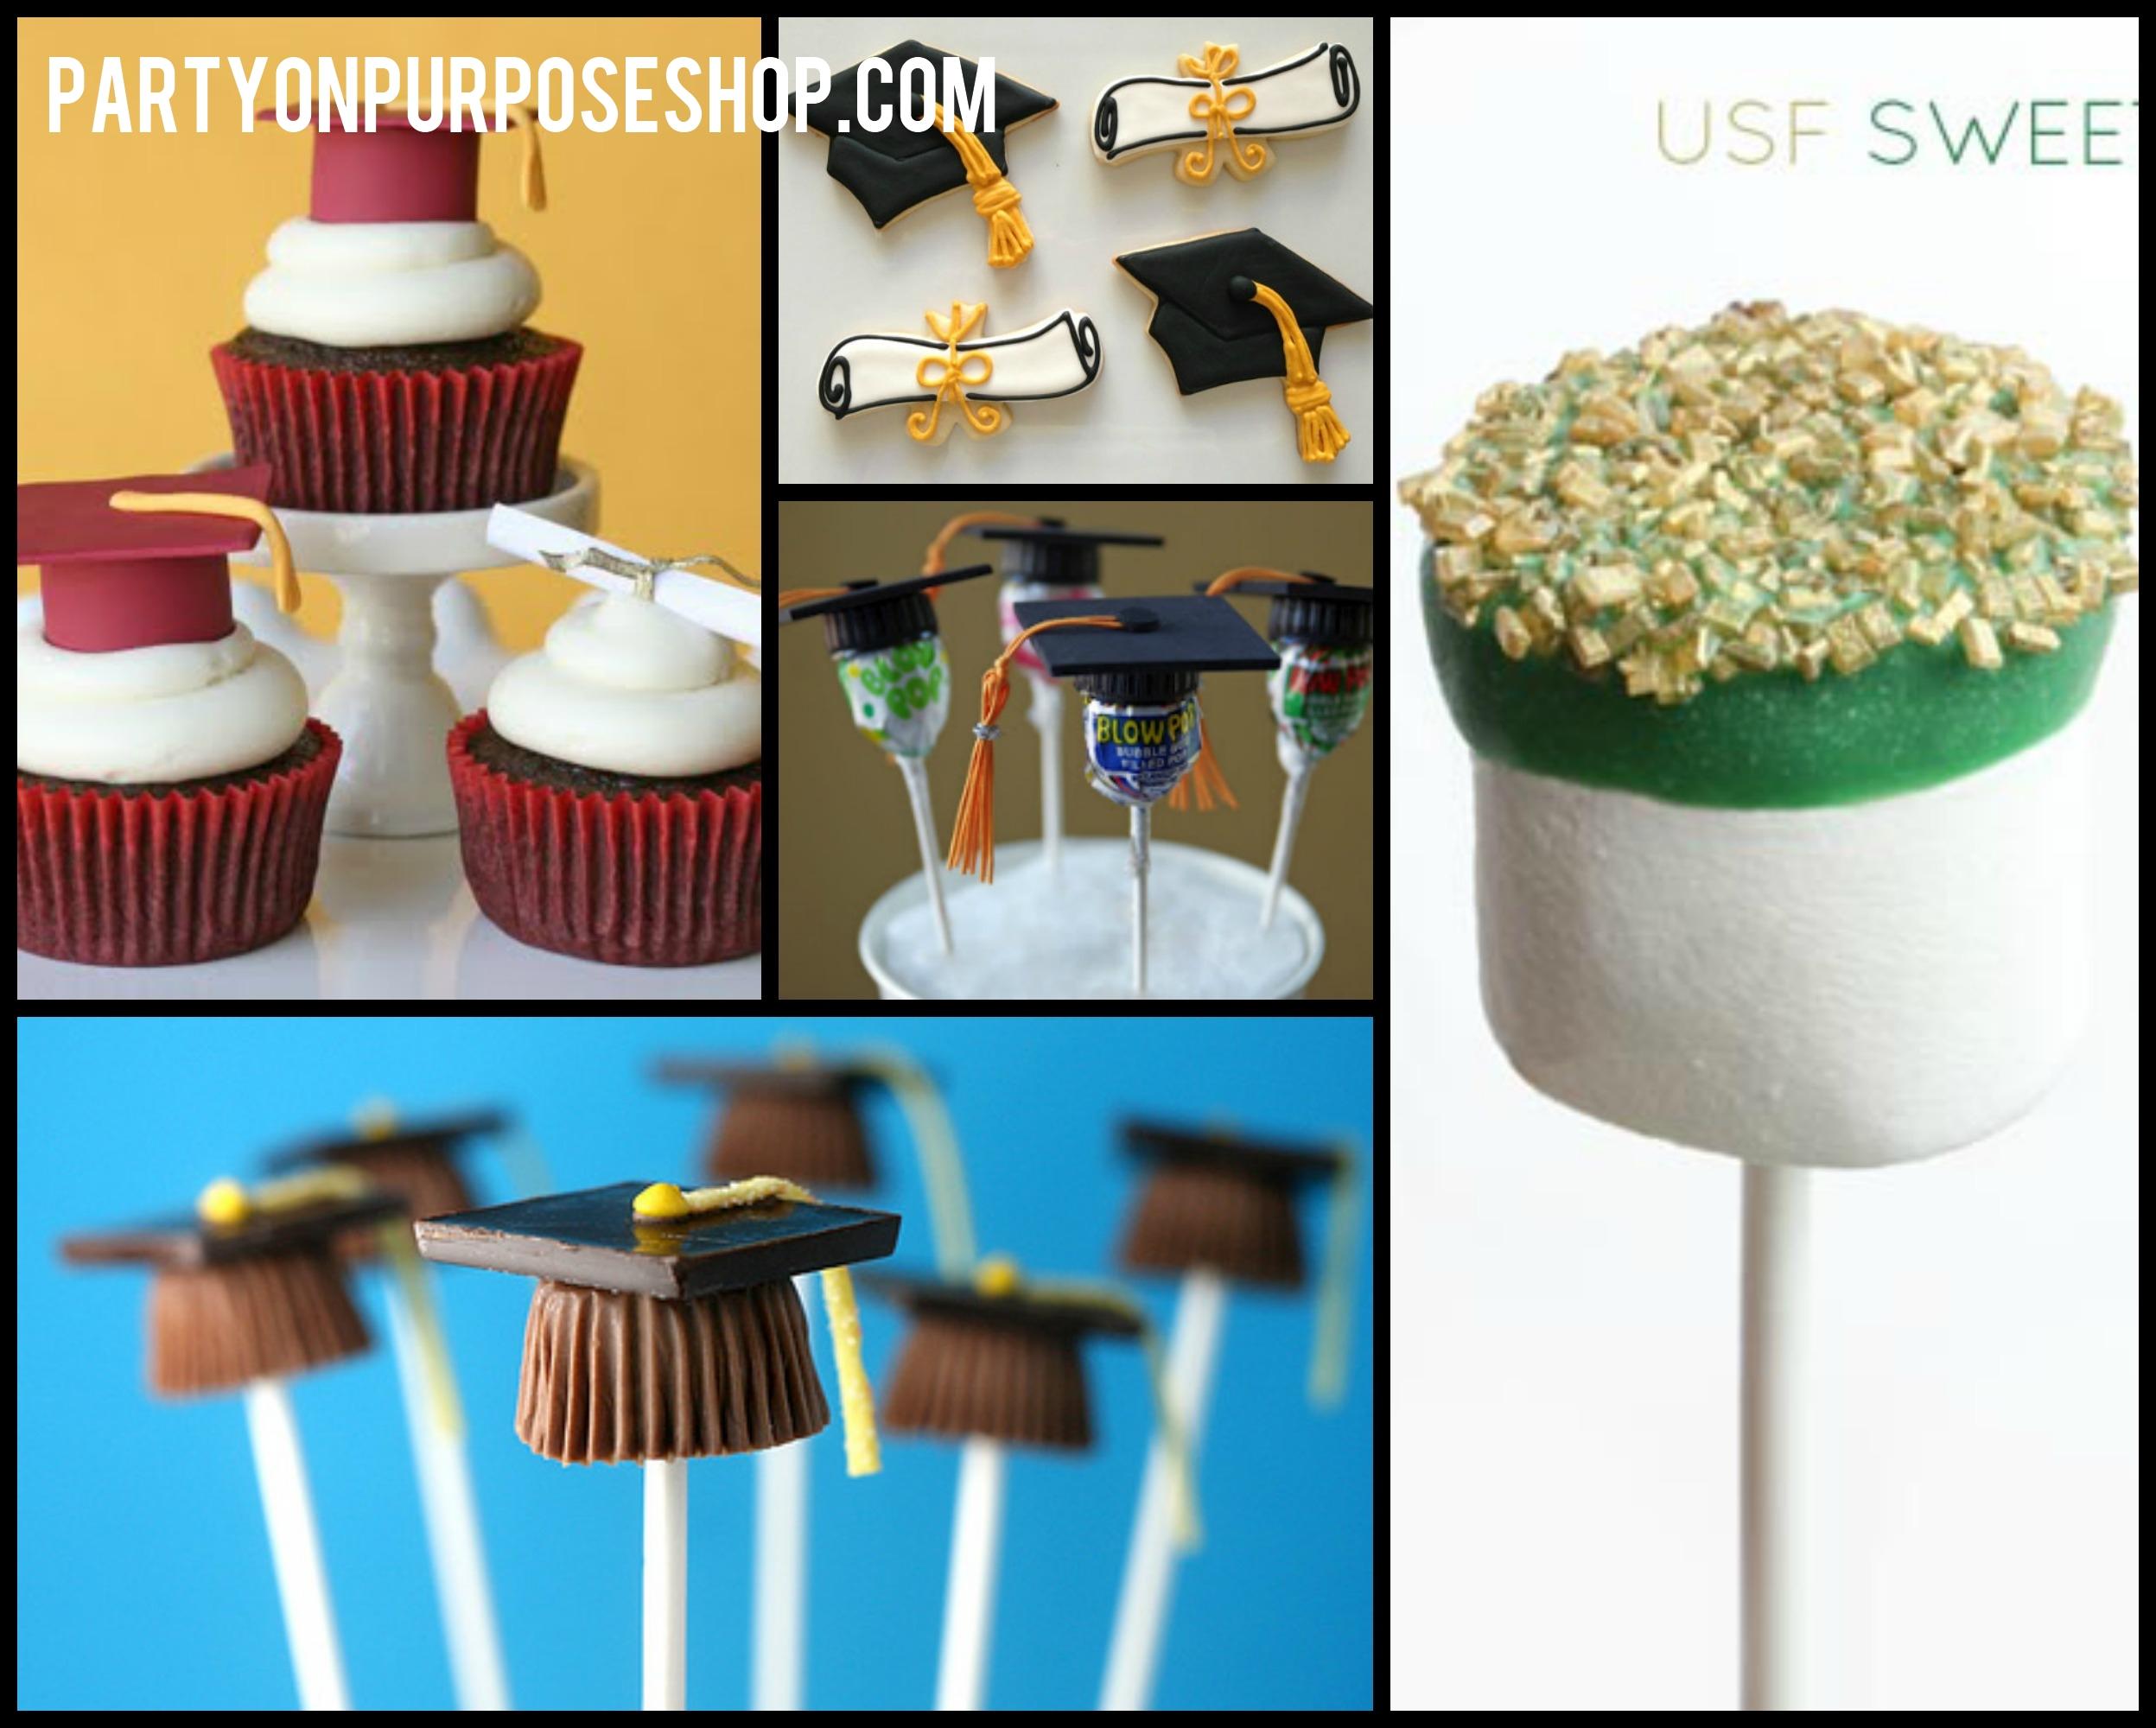 10 Fabulous Food Ideas For Graduation Party graduation party week food and drink ideas party on purpose 1